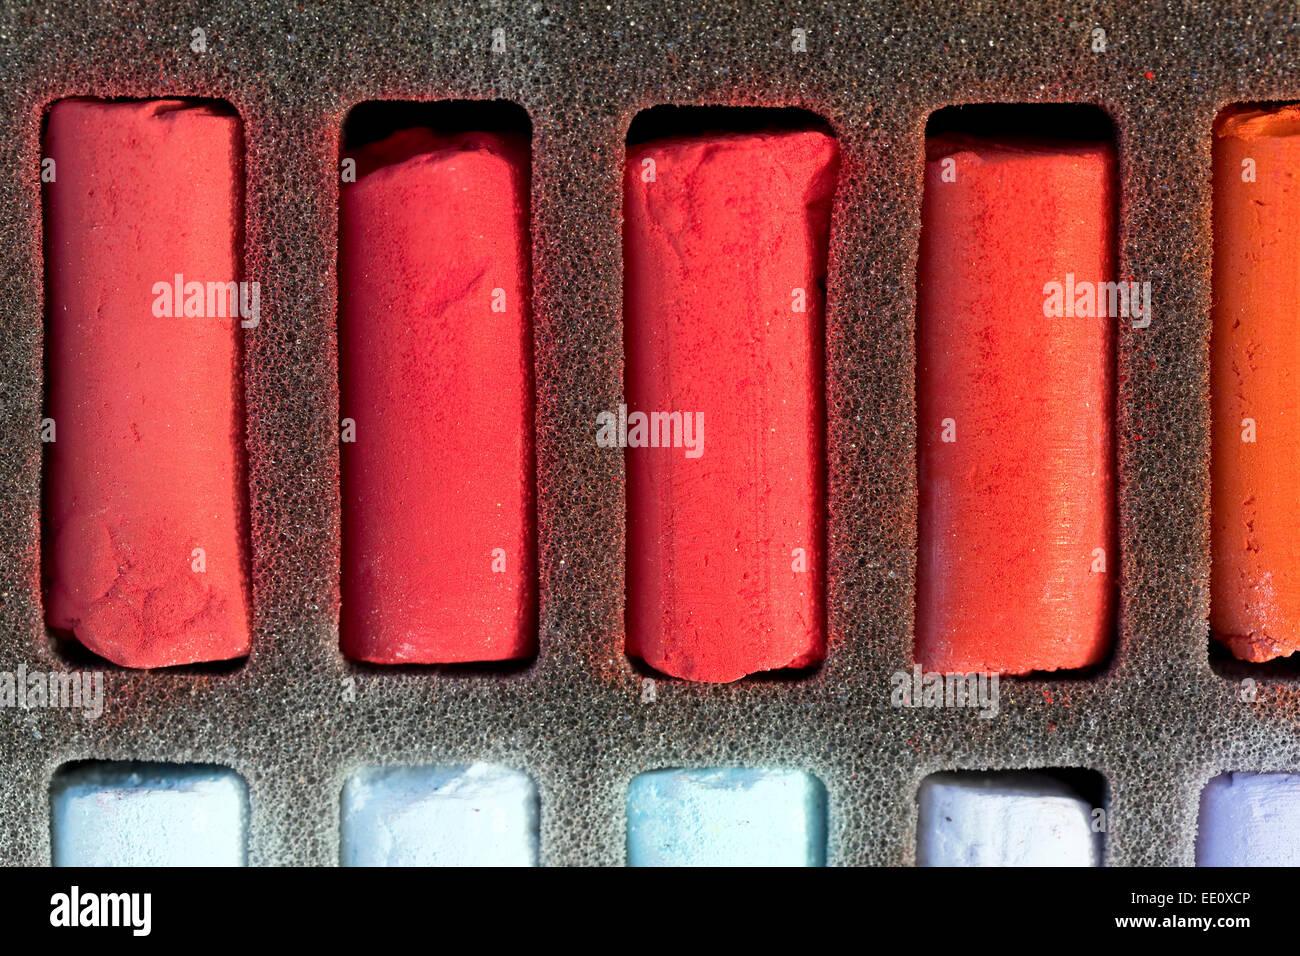 Chalk Pastel Set, red pigmented pastels - Stock Image